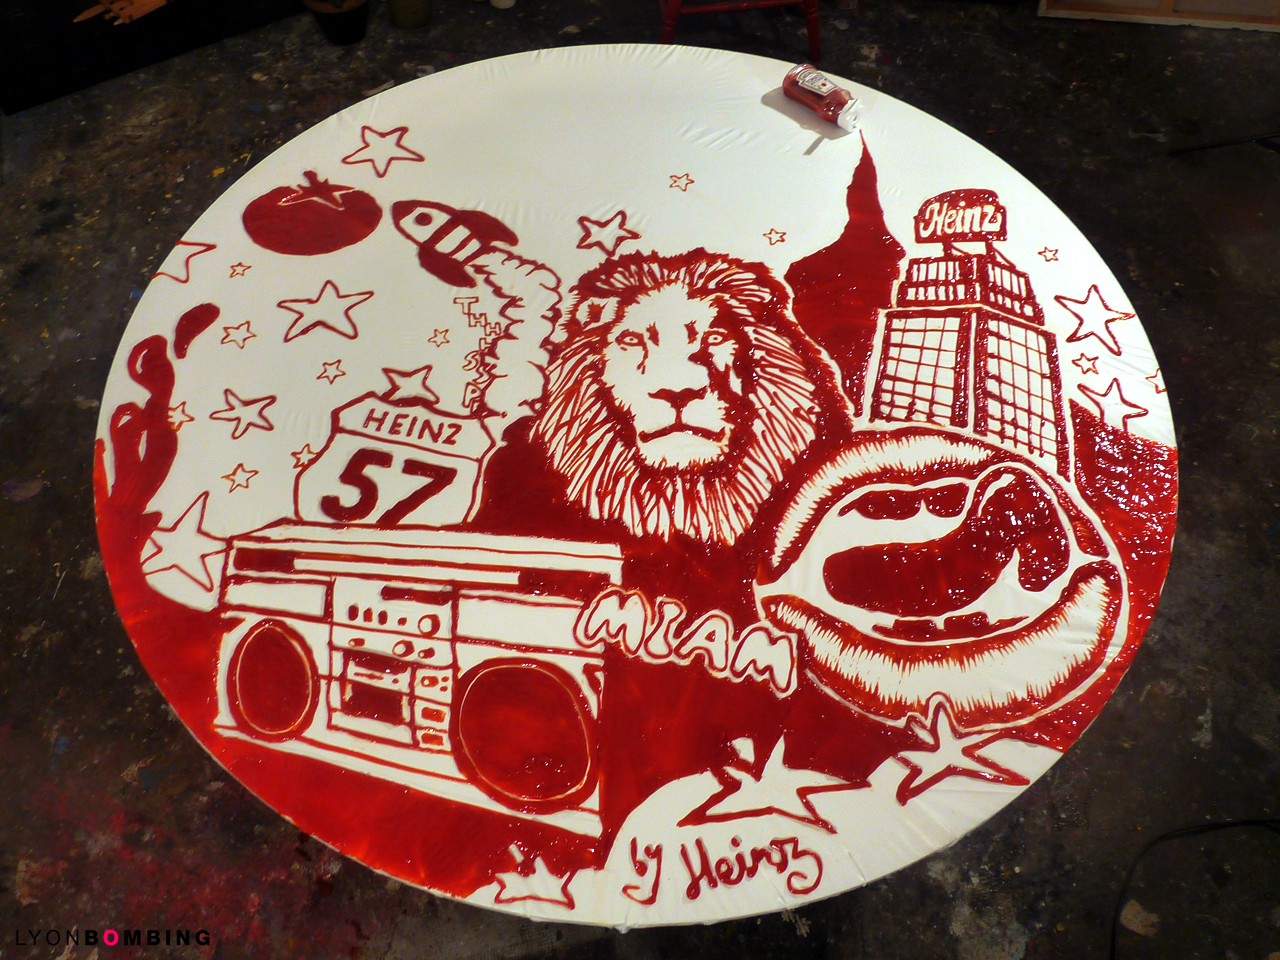 Peinture au ketchup Heinz